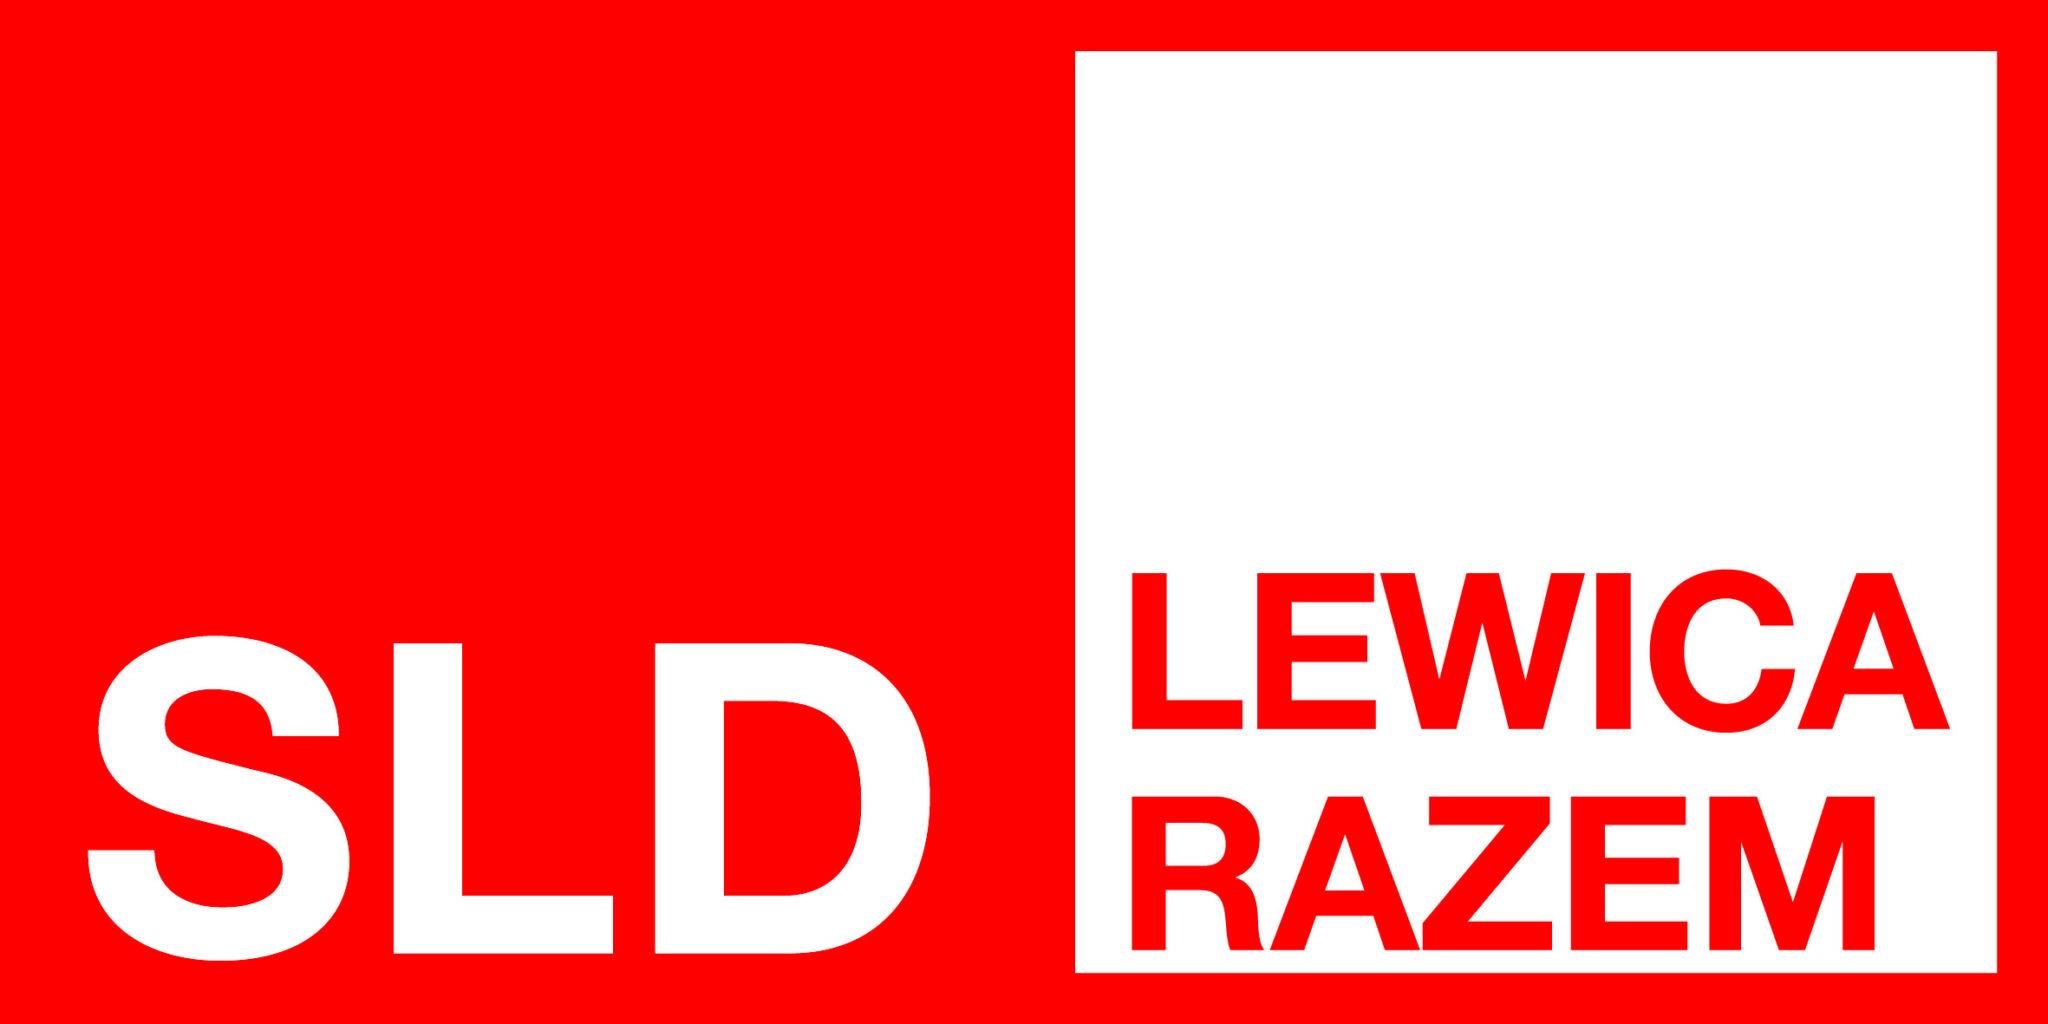 SLD Lewica Razem